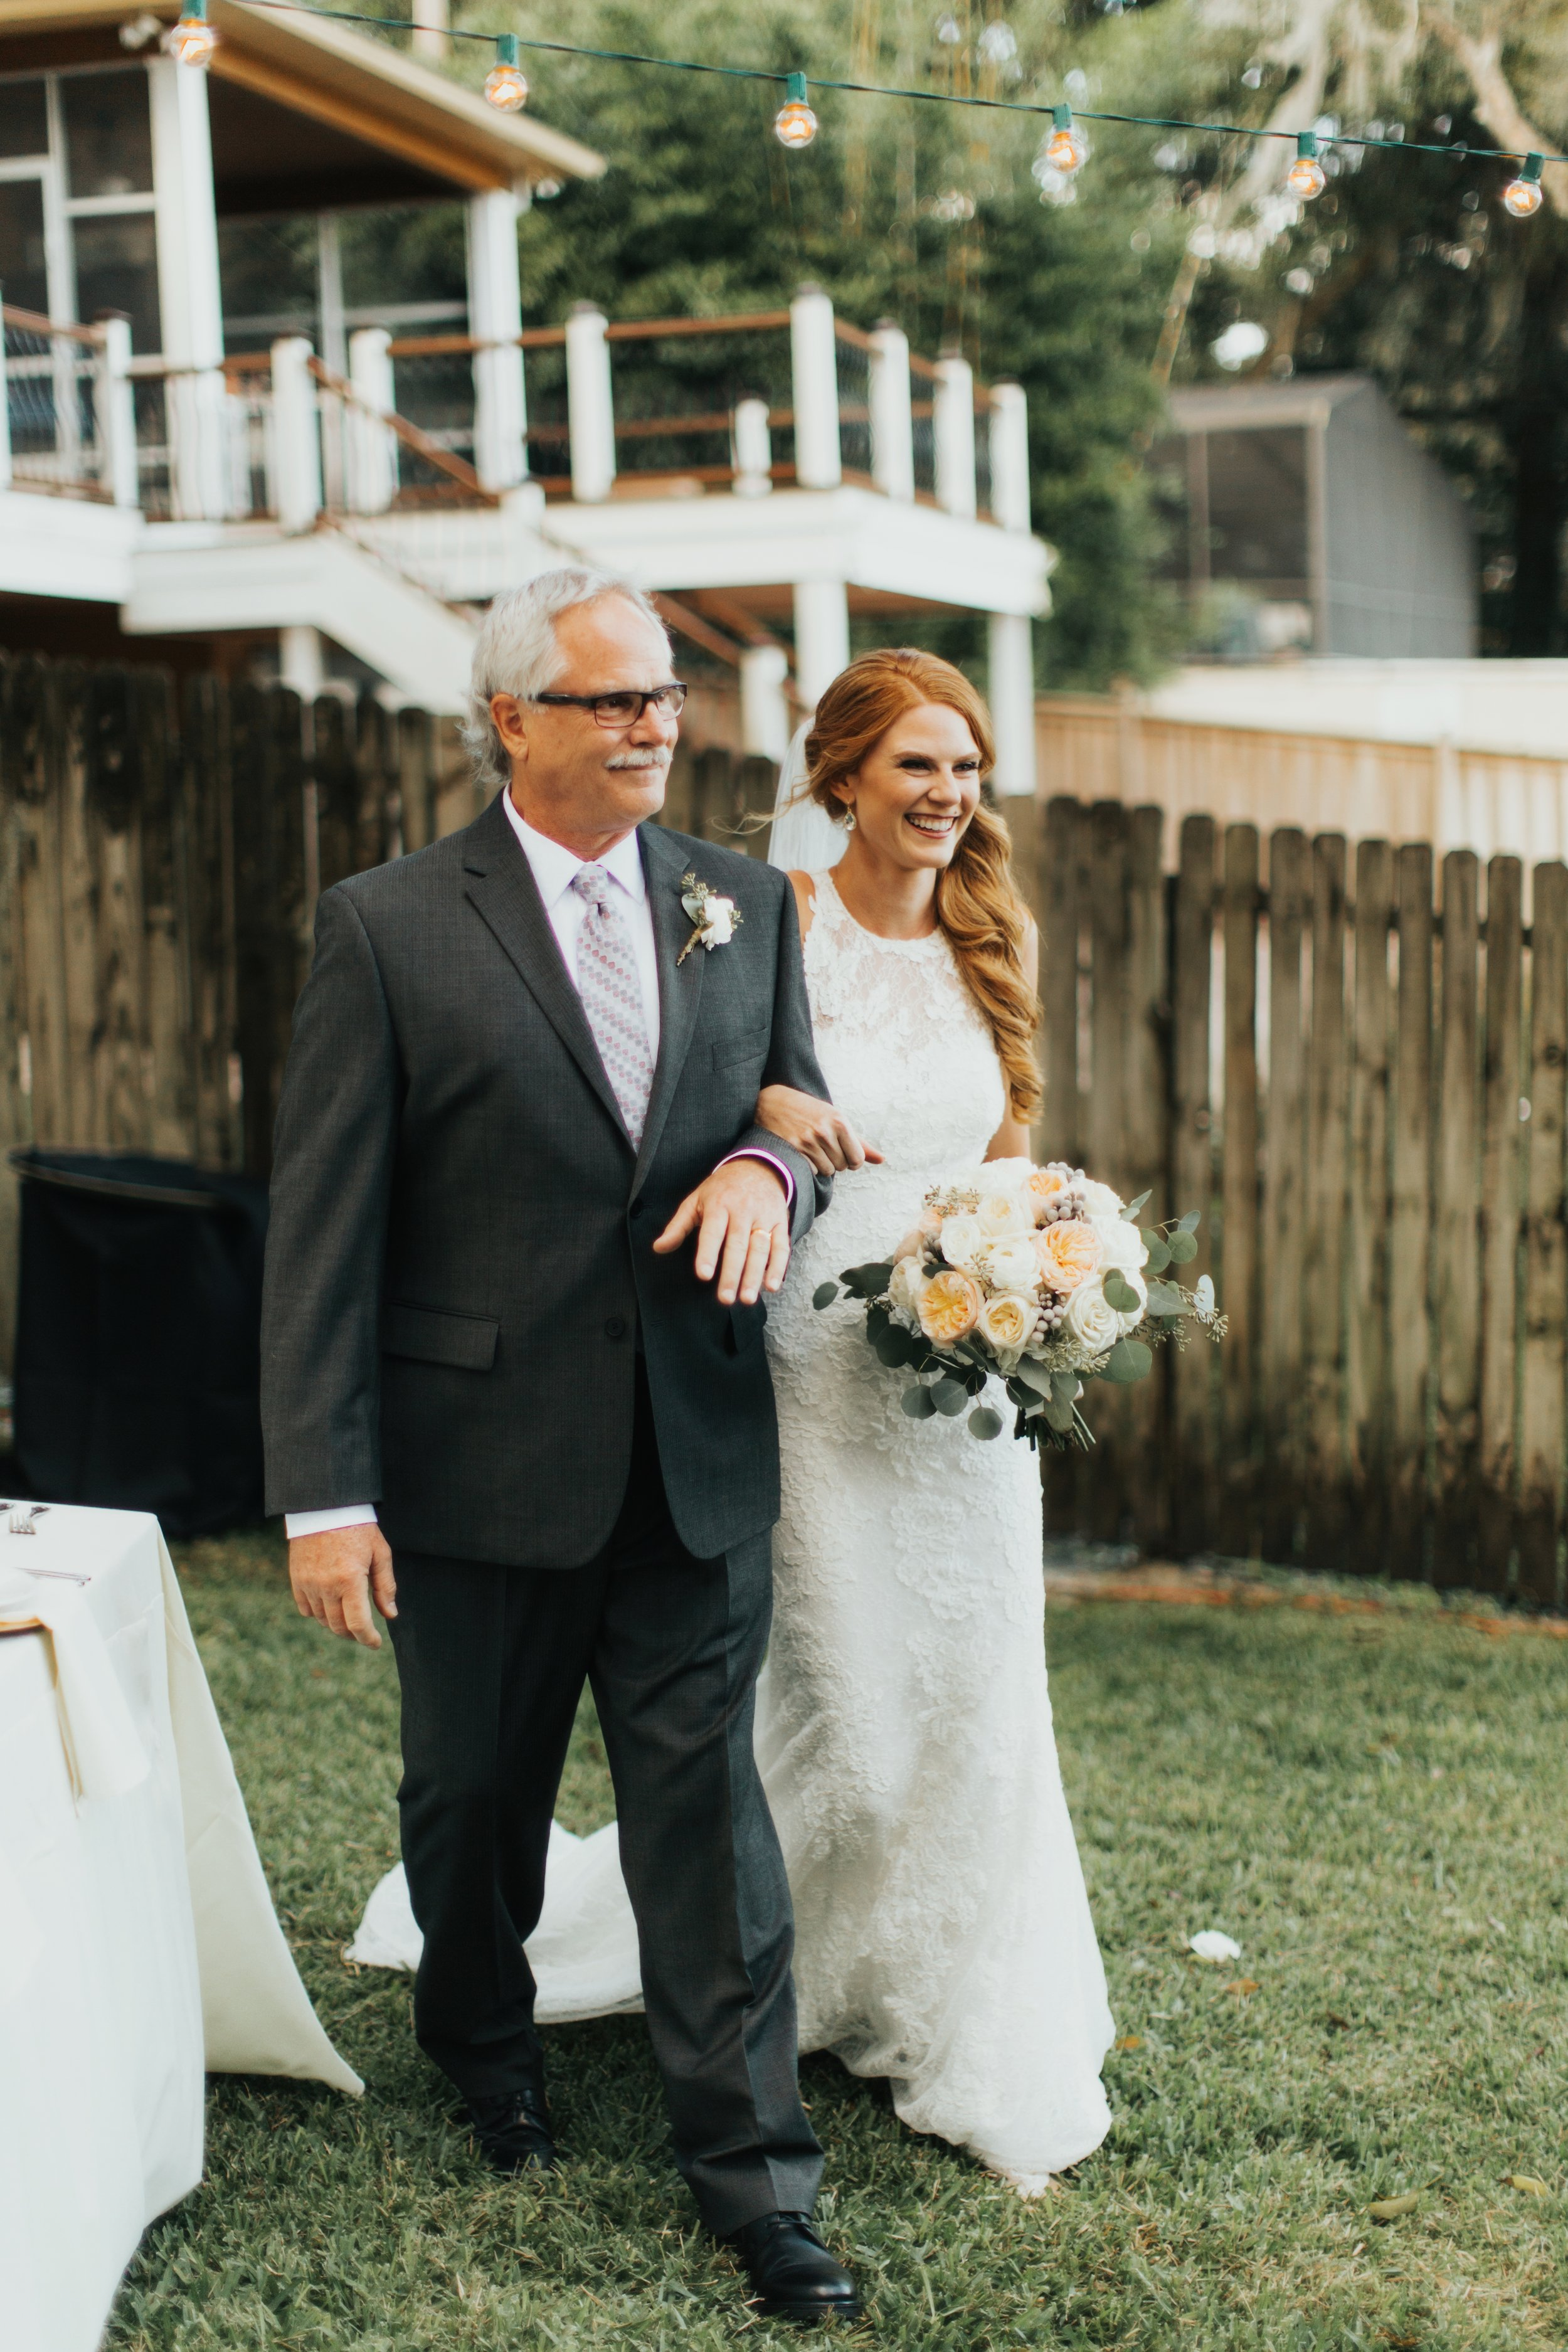 Wedding Day | Vanessa Boy | vanessaboy.com-570.com .jpg